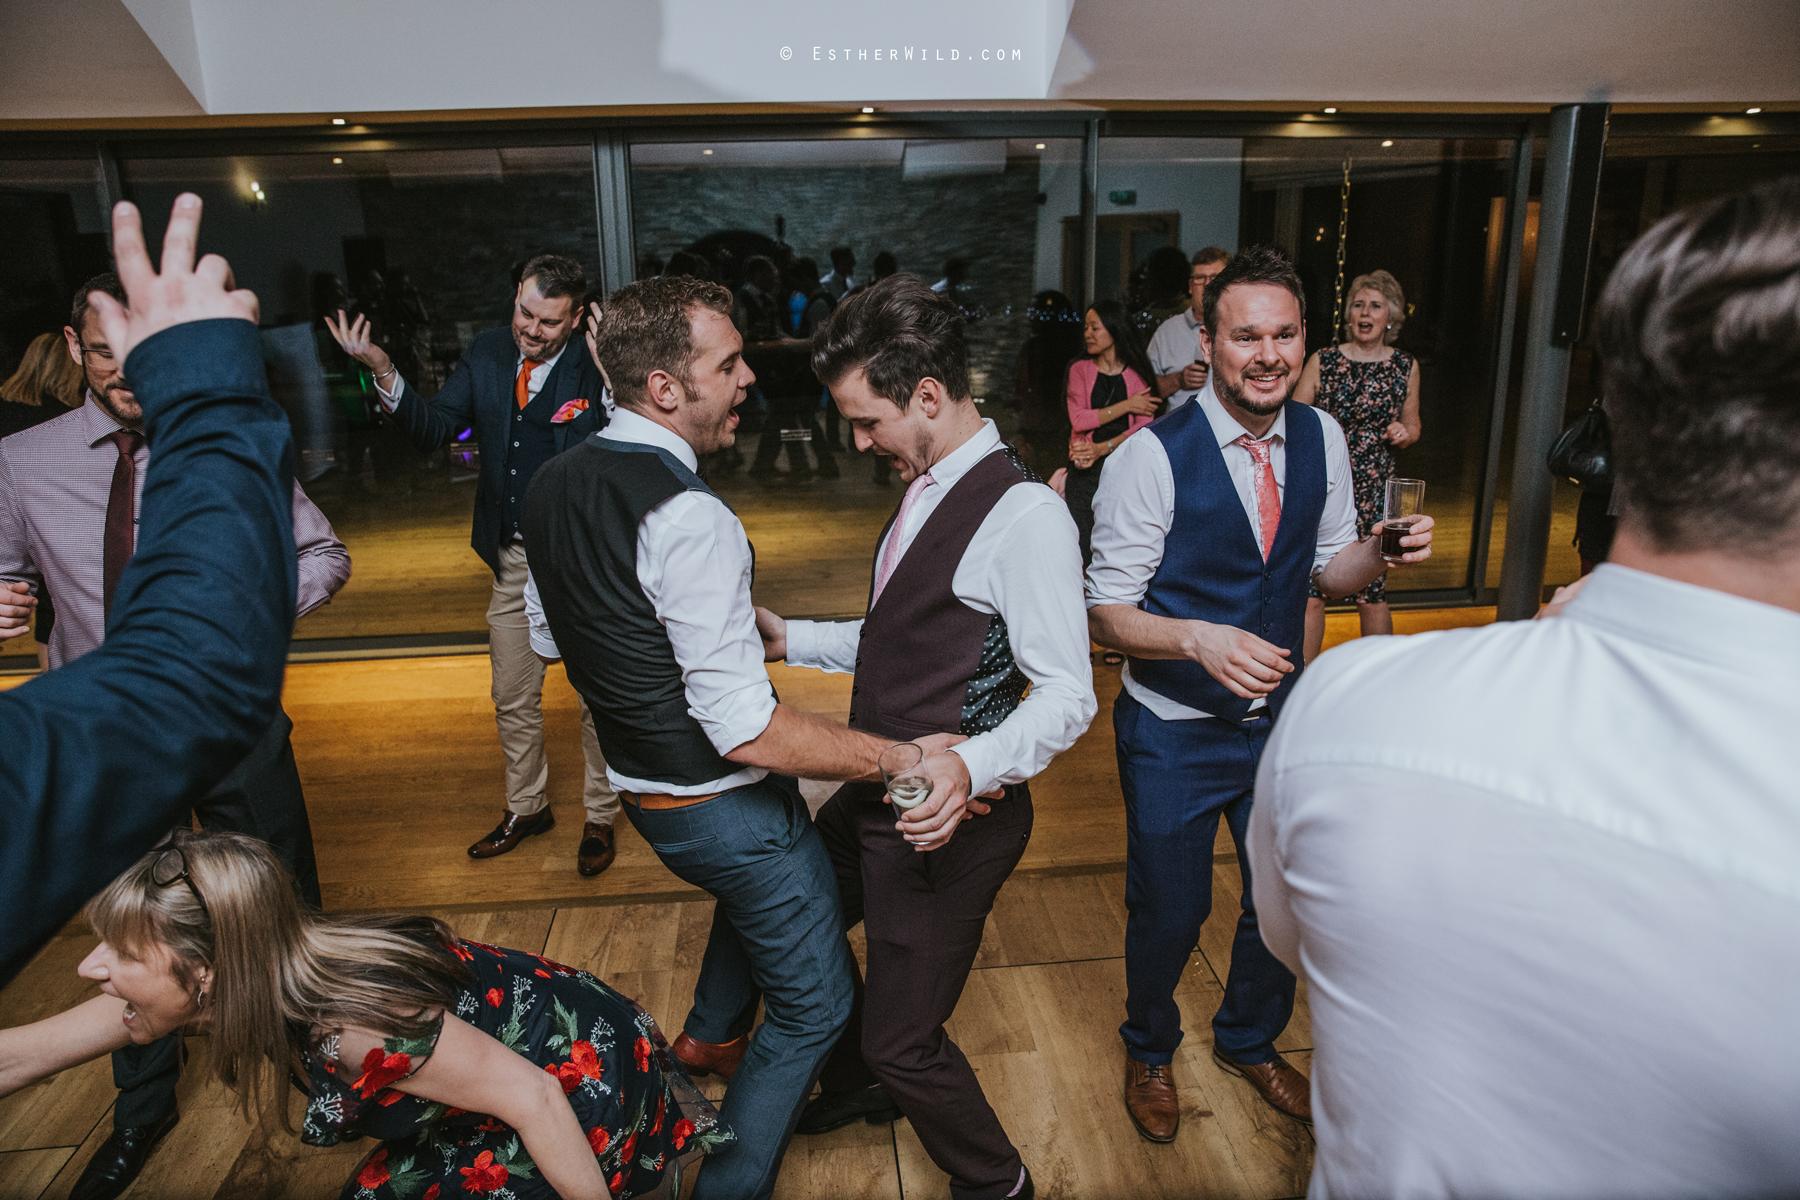 The_BoatHouse_Wedding_Venue_Ormesby_Norfolk_Broads_Boat_Wedding_Photography_Esther_Wild_Photographer_IMG_3833.jpg